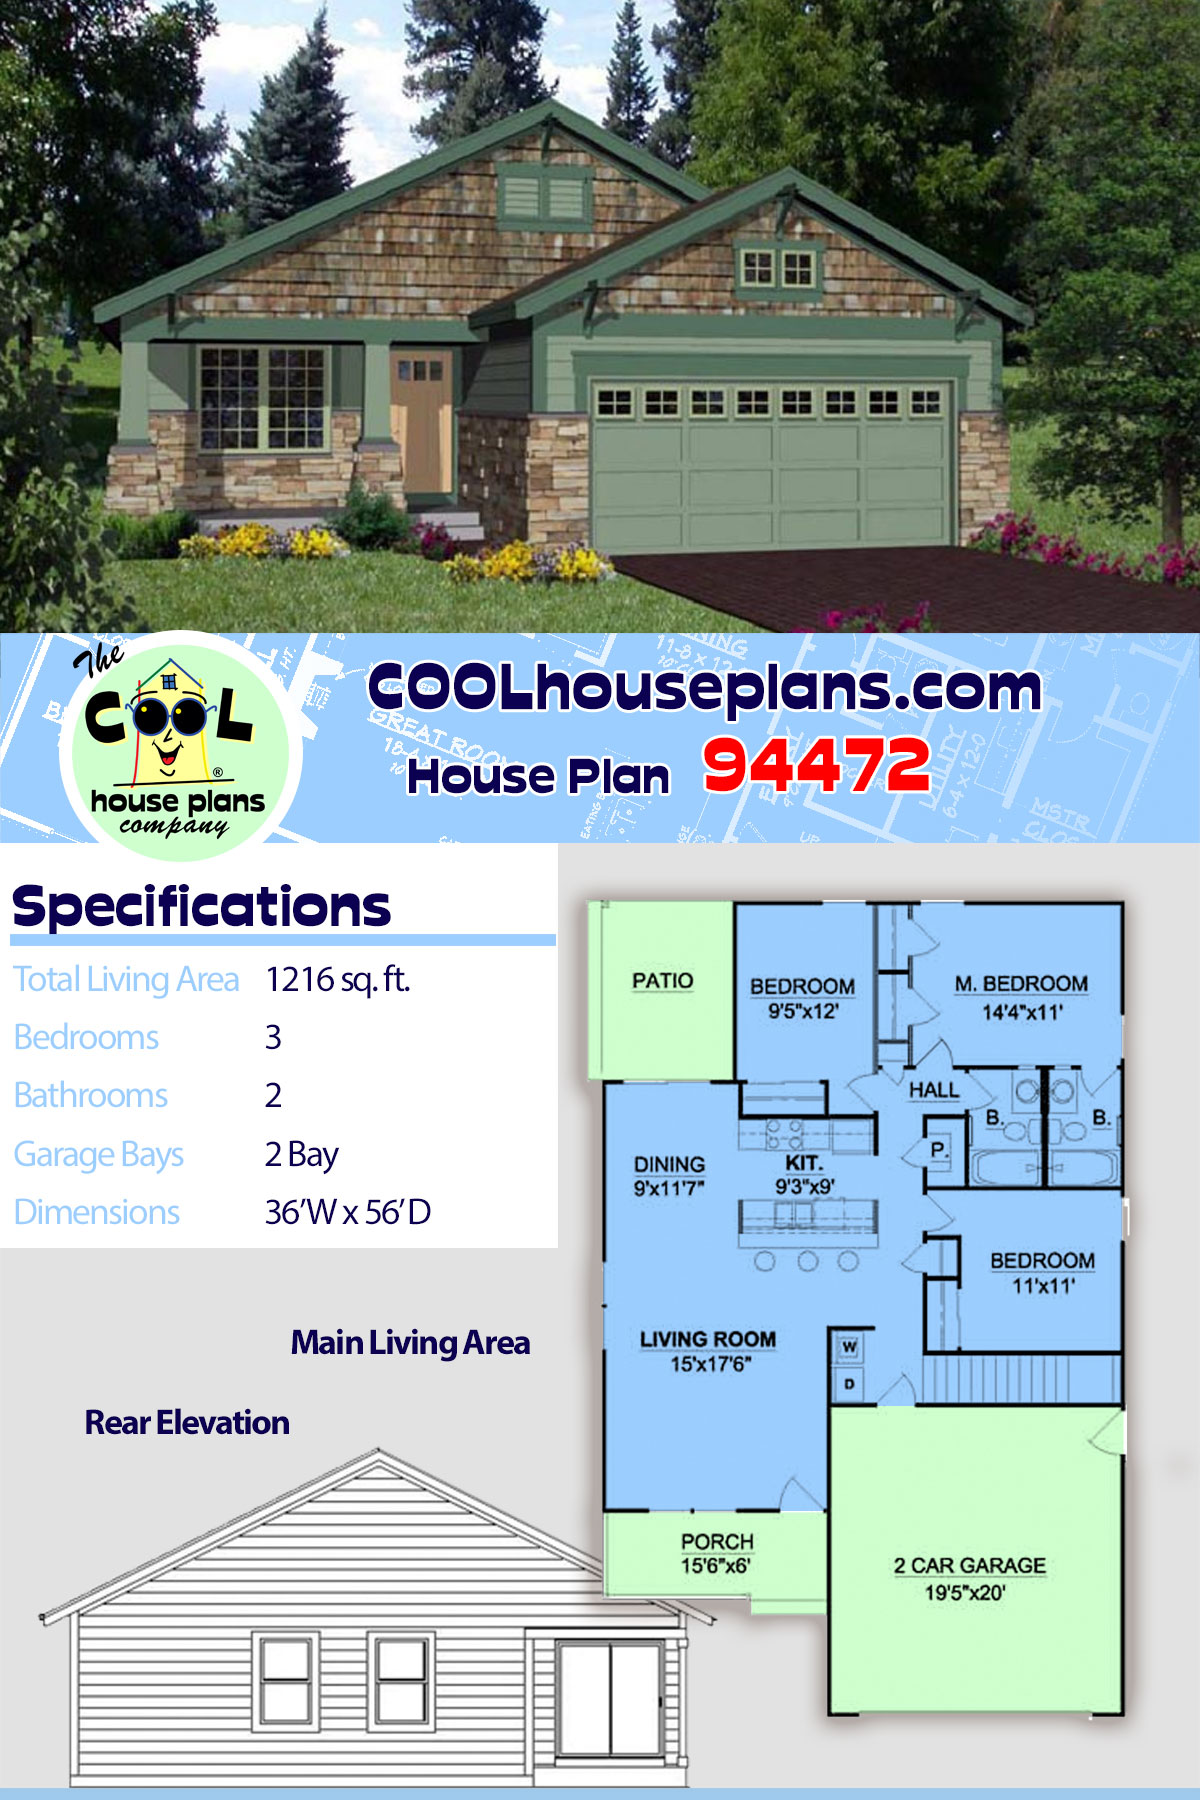 Craftsman House Plan 94472 with 3 Beds, 2 Baths, 2 Car Garage